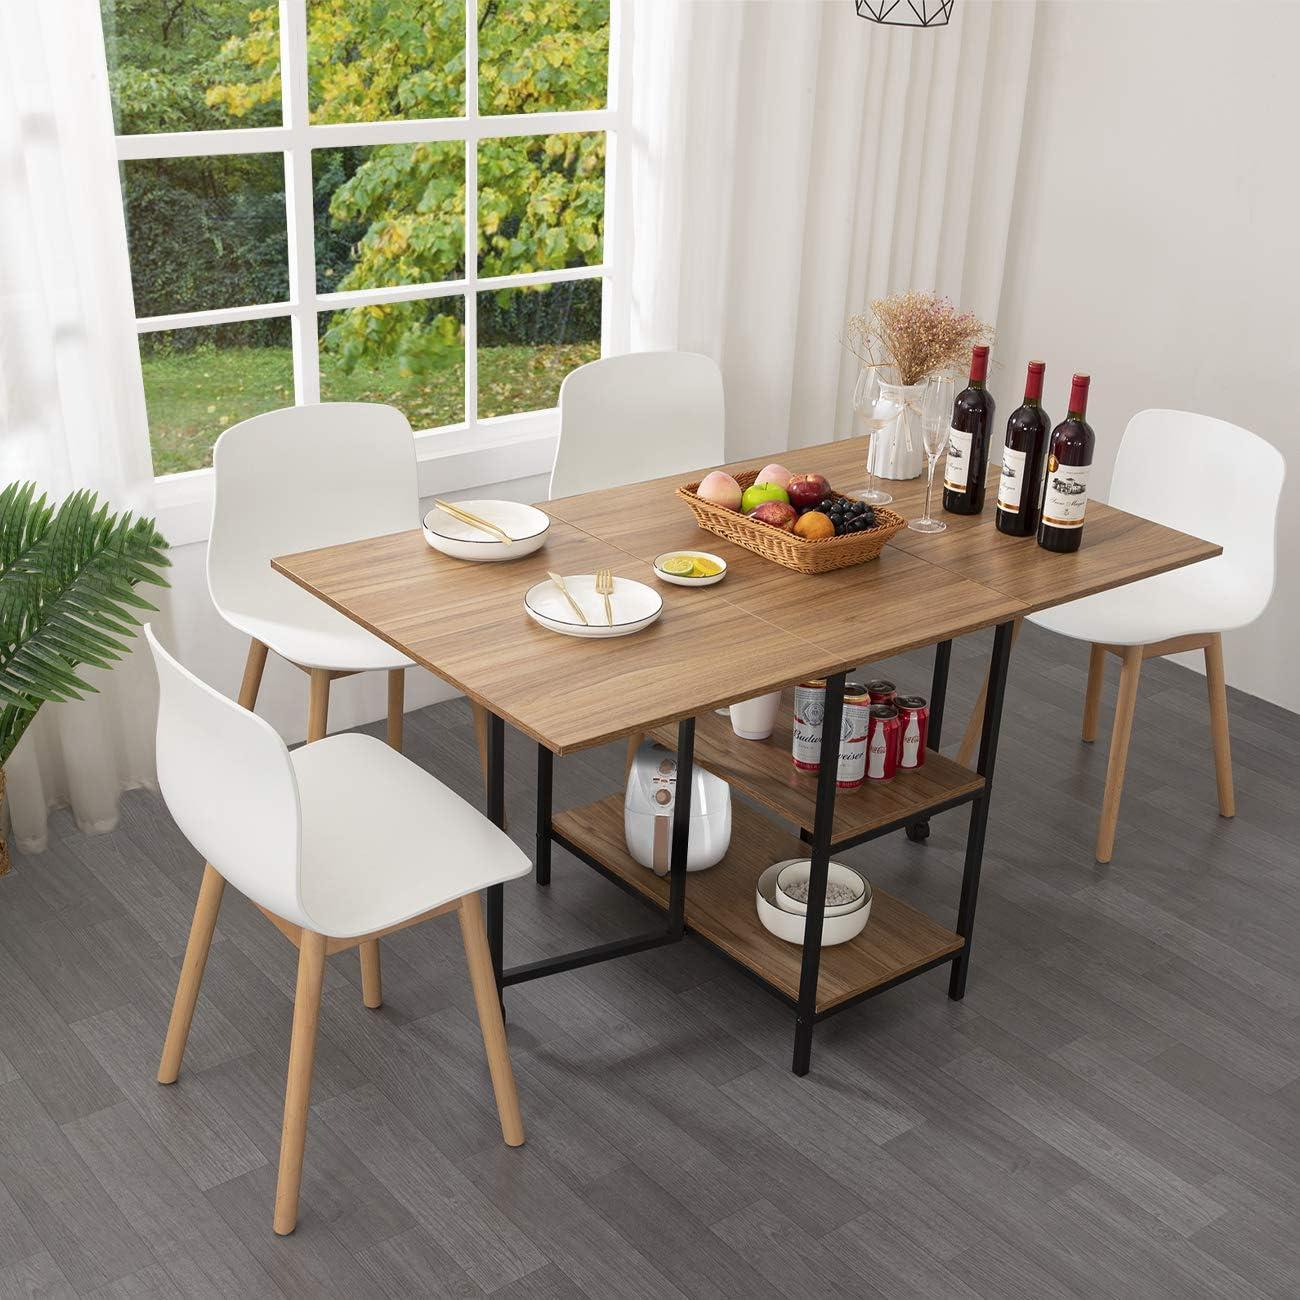 Kotpop Folding Dinner Table Drop, Folding Dining Room Table